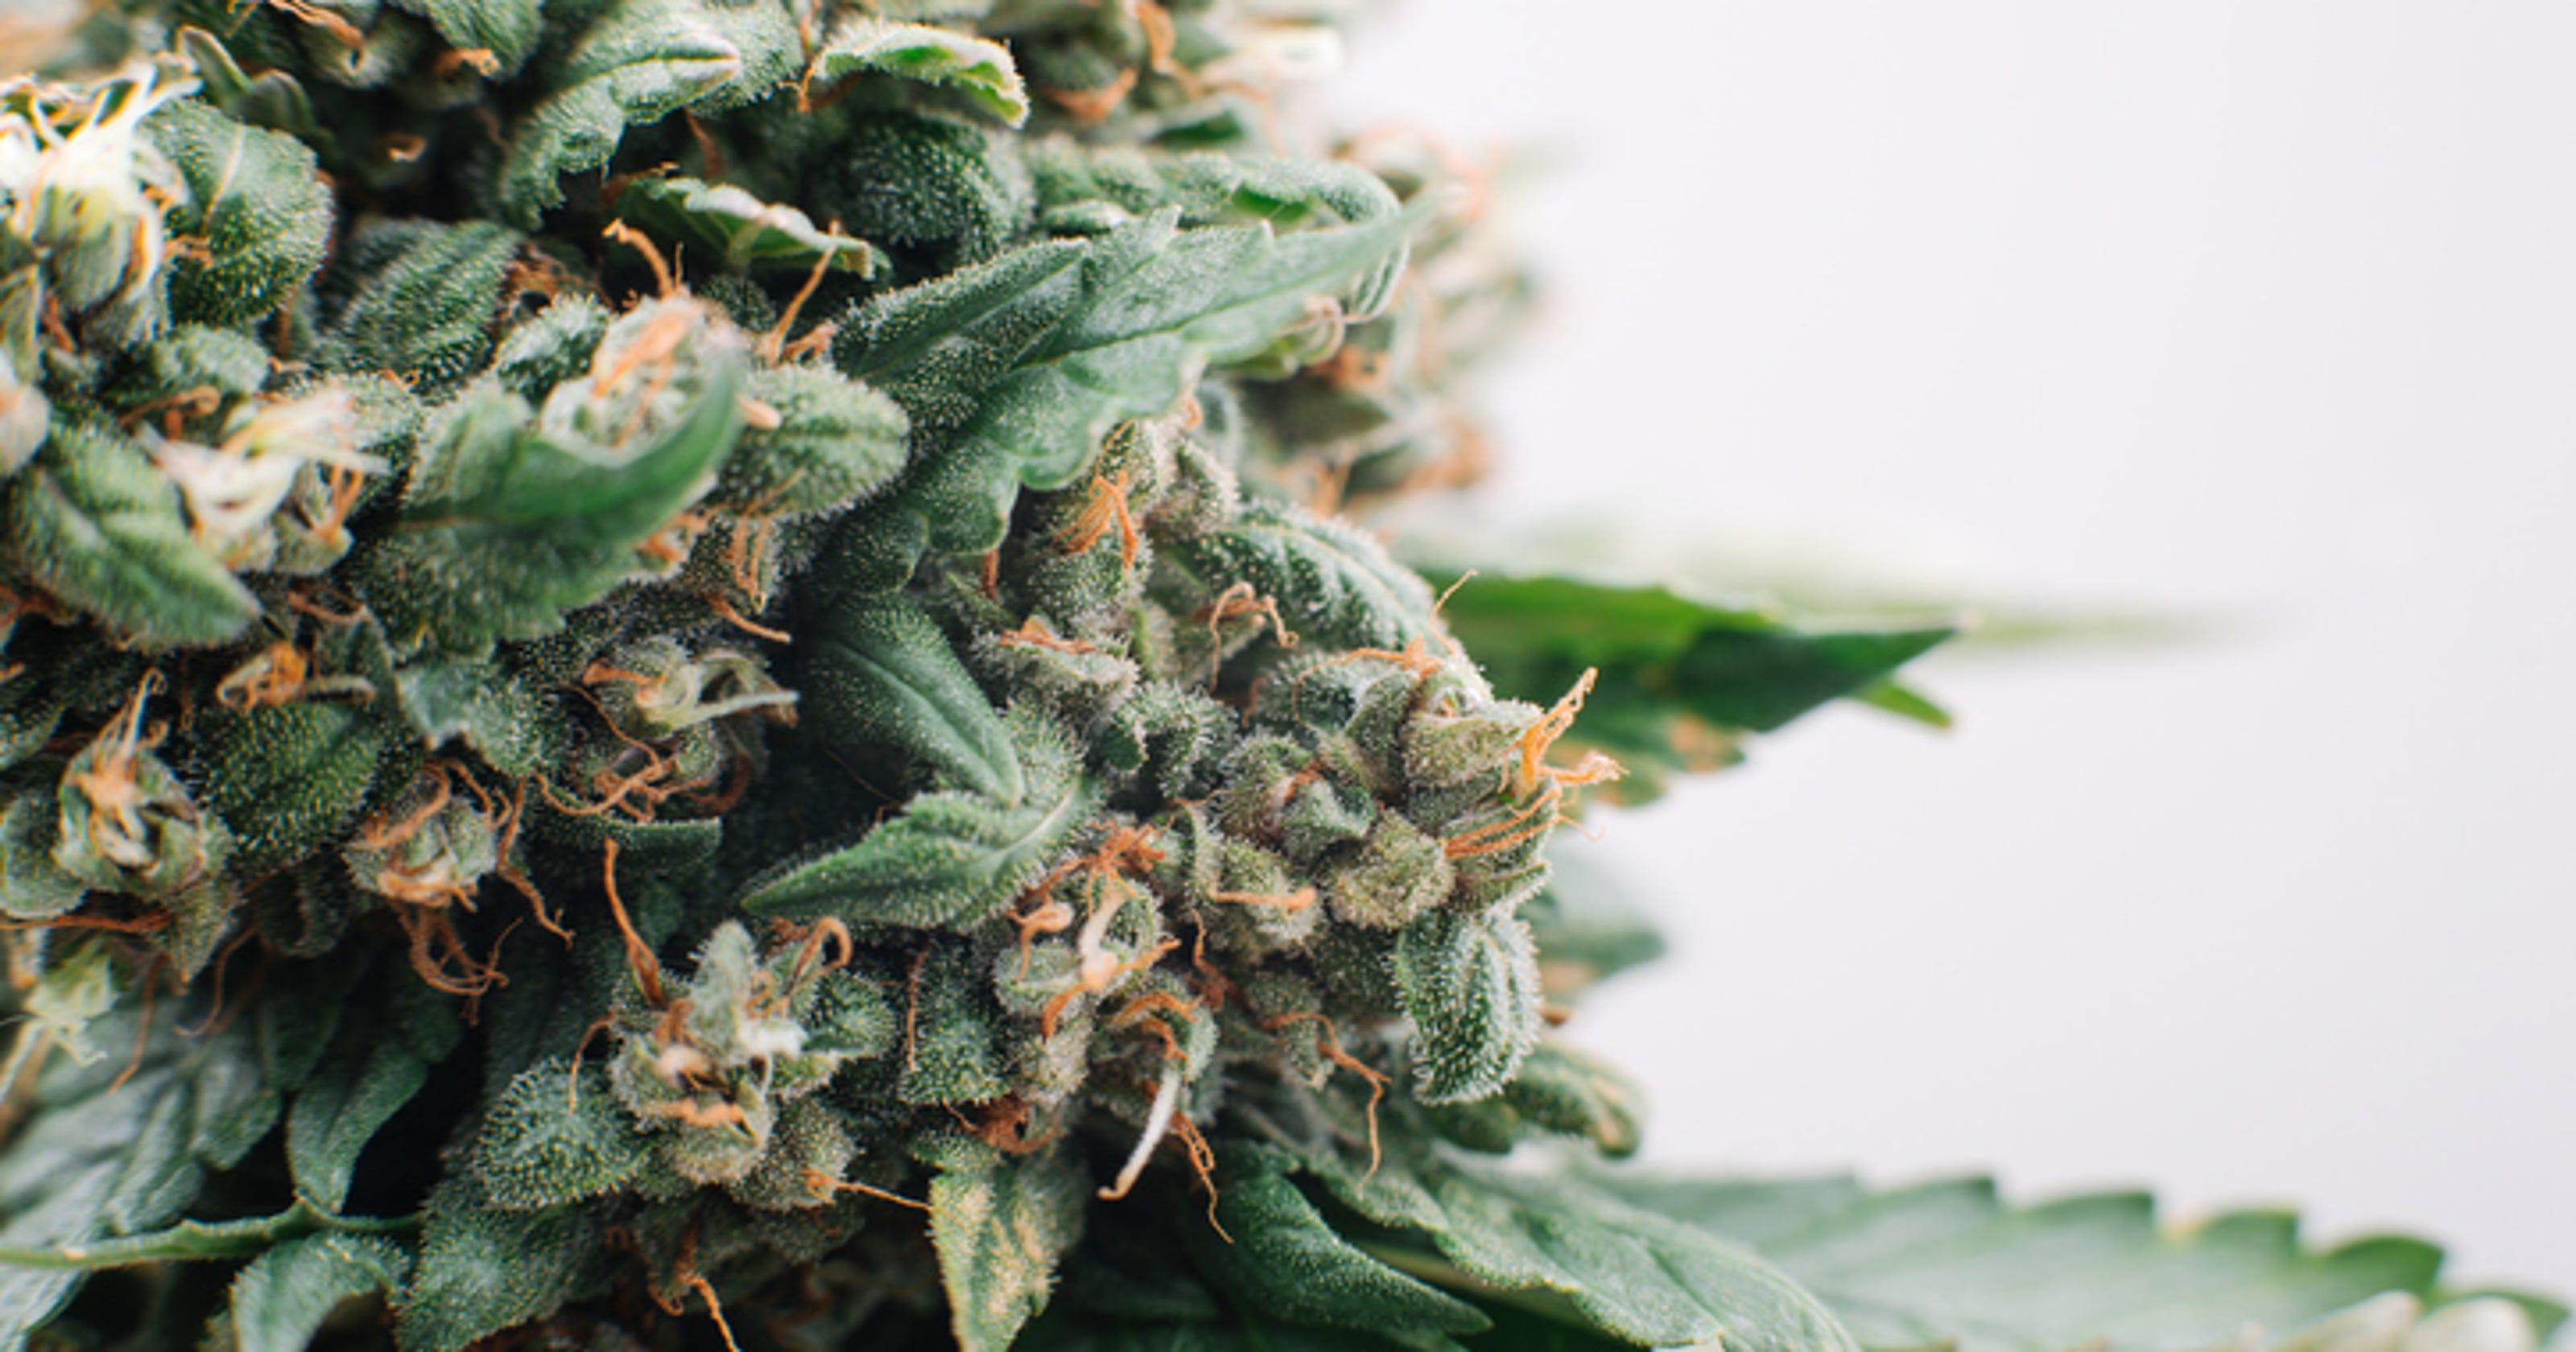 Medical marijuana card cost in Arizona could be cut by half